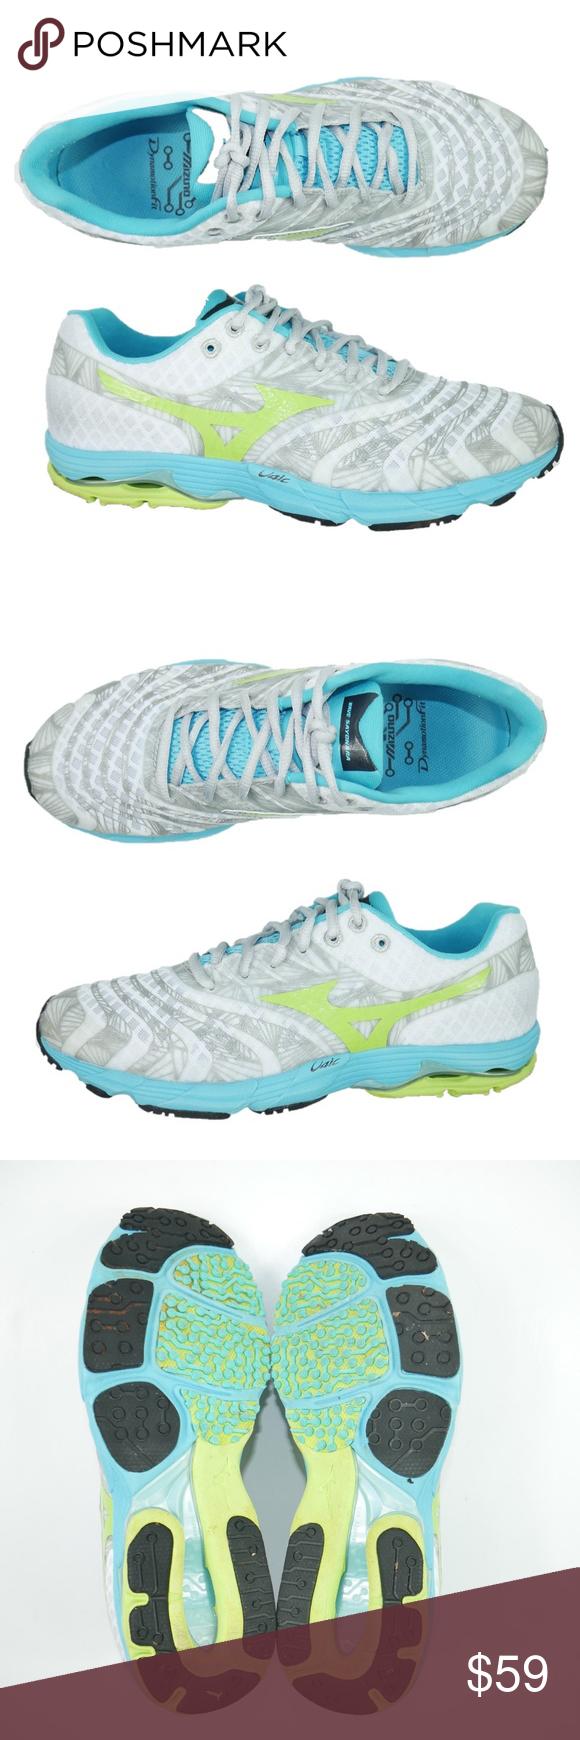 mizuno lightweight running shoes